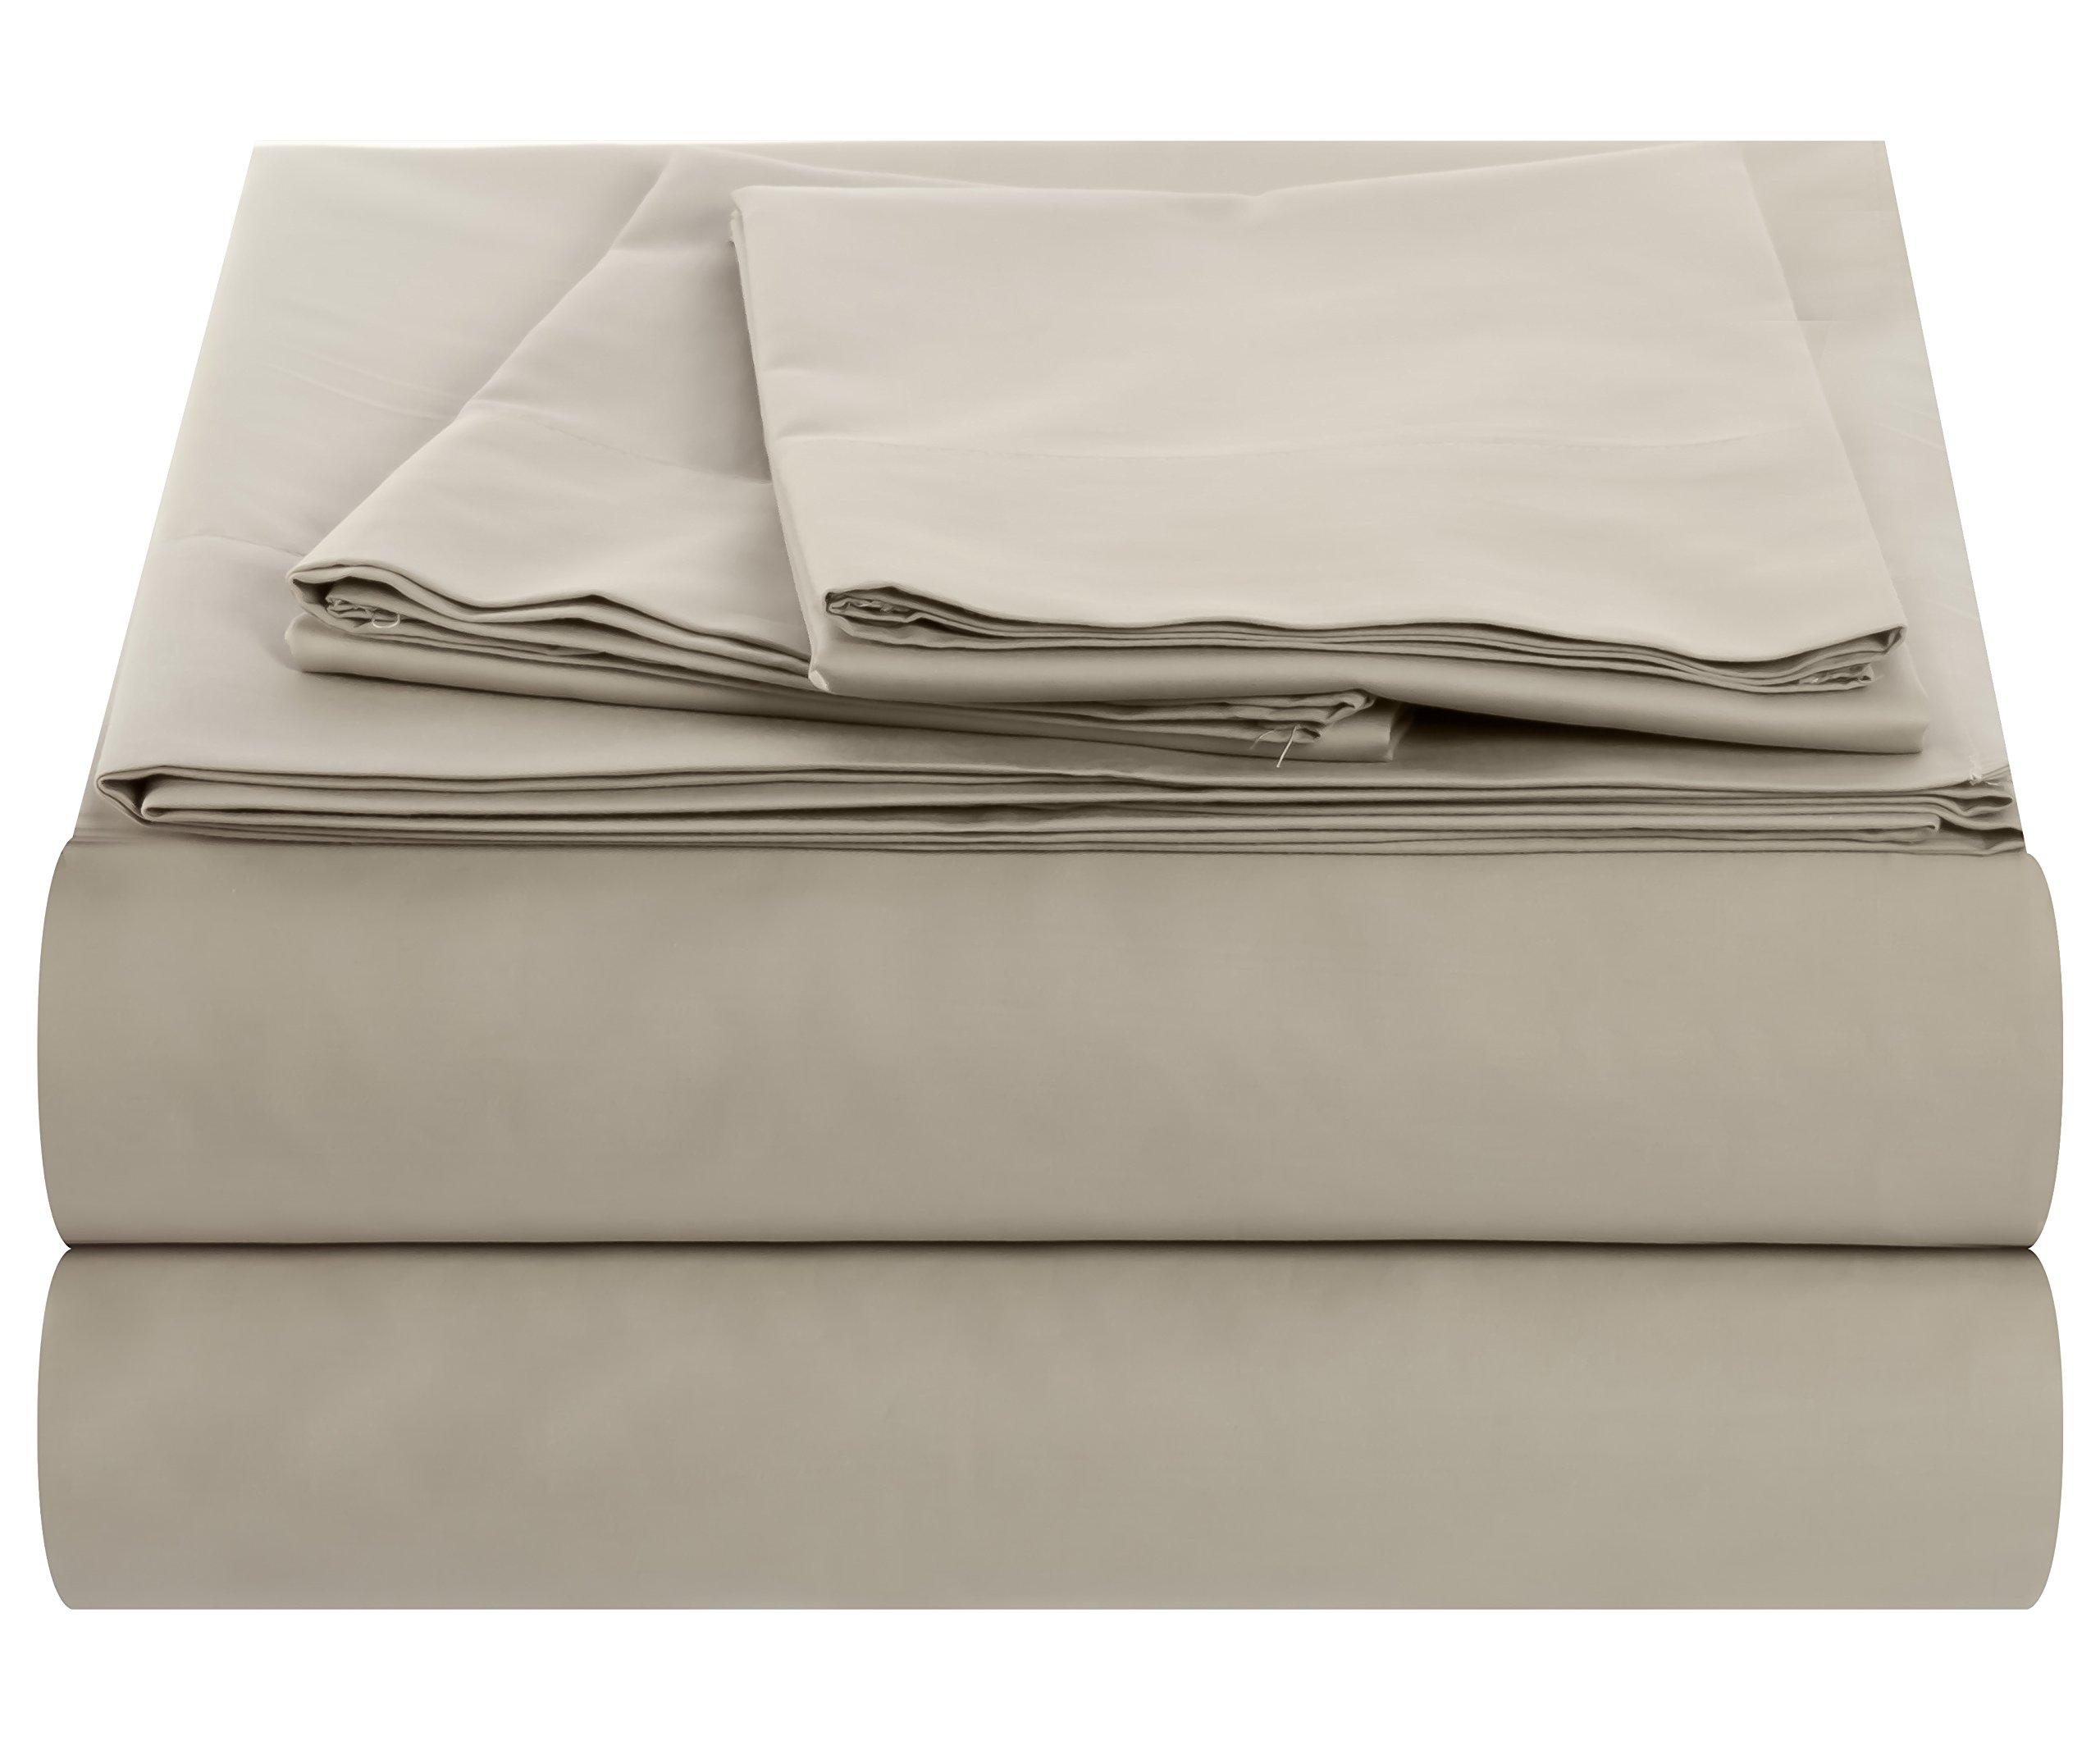 Outlast All Season Temperature Regulating Sheet Set in Linen, Full